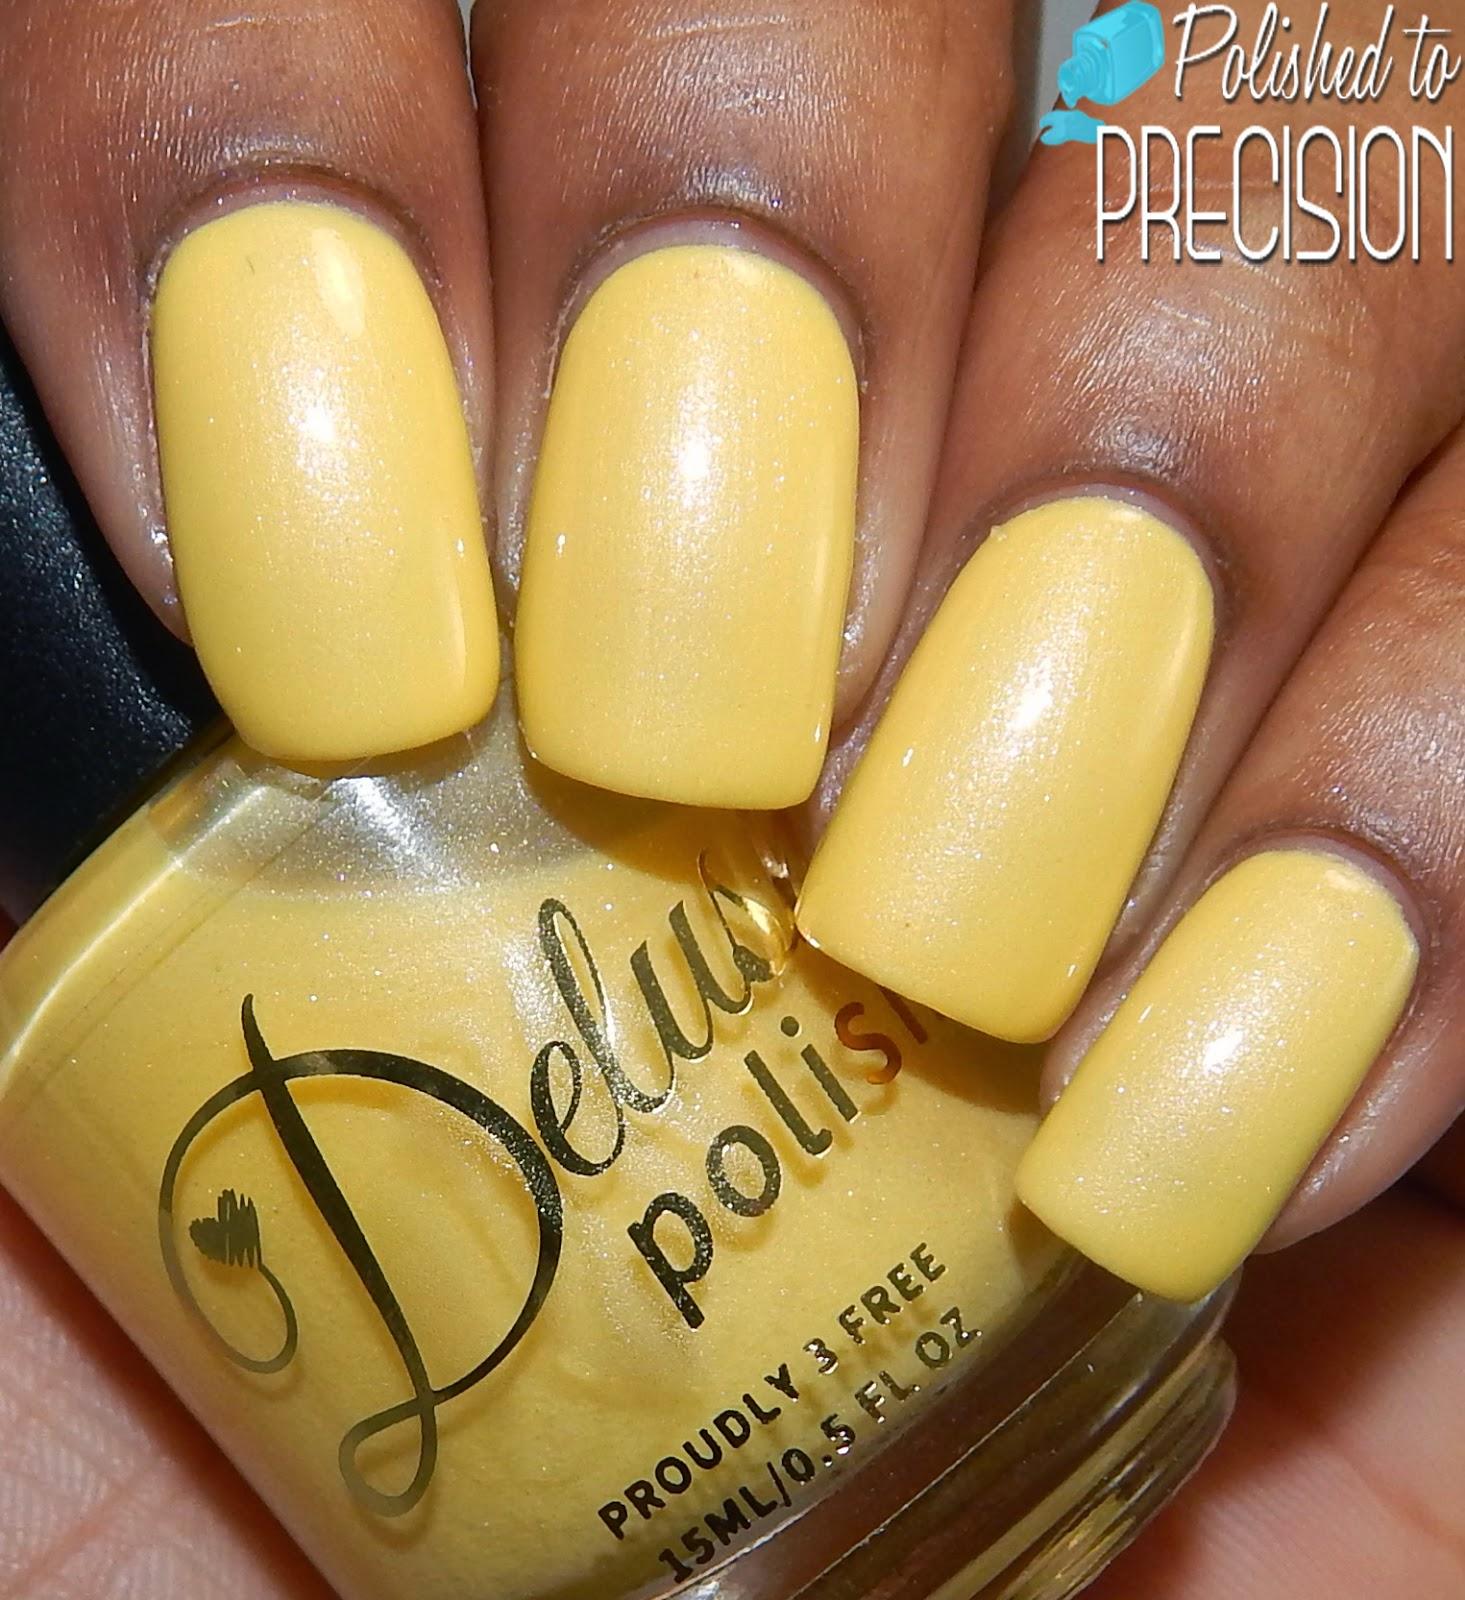 Delush Polish You Go Glow Girl!